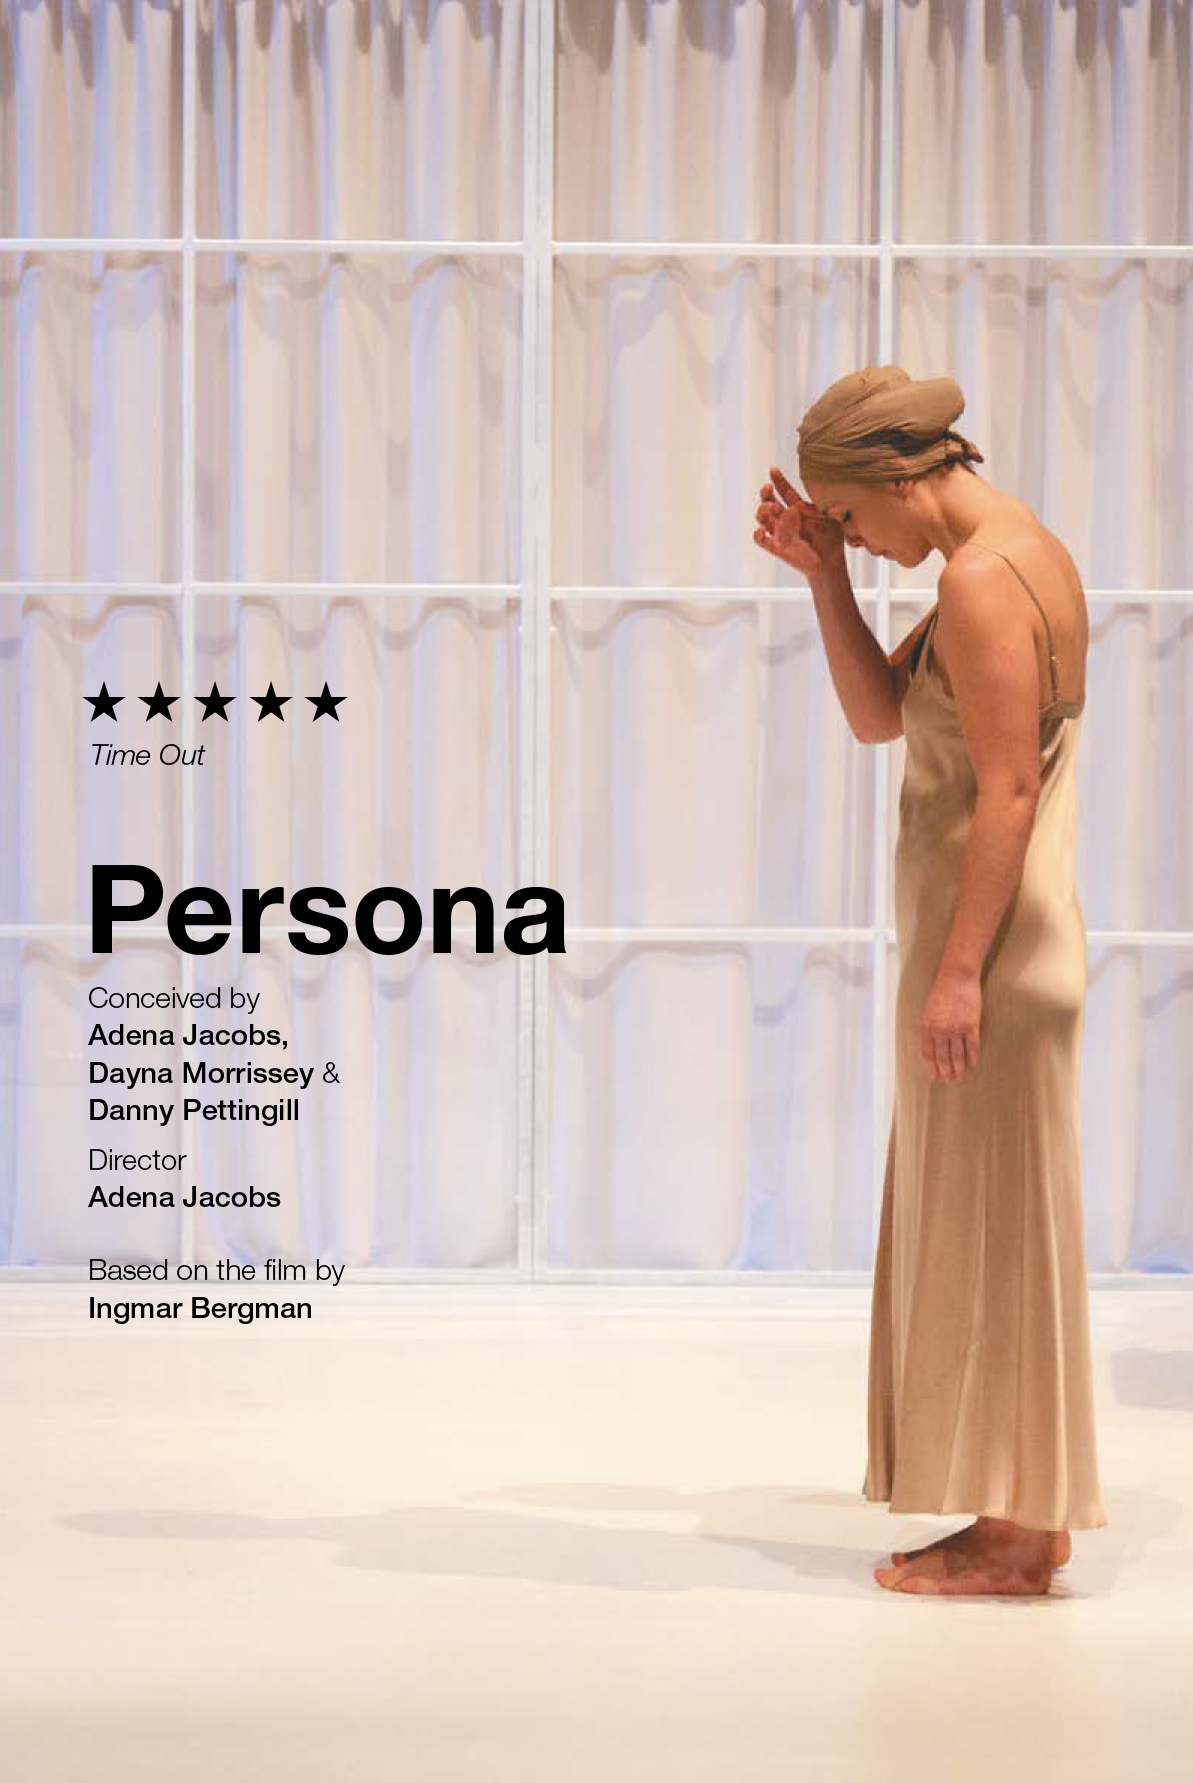 Persona-avantcard4-1.jpg